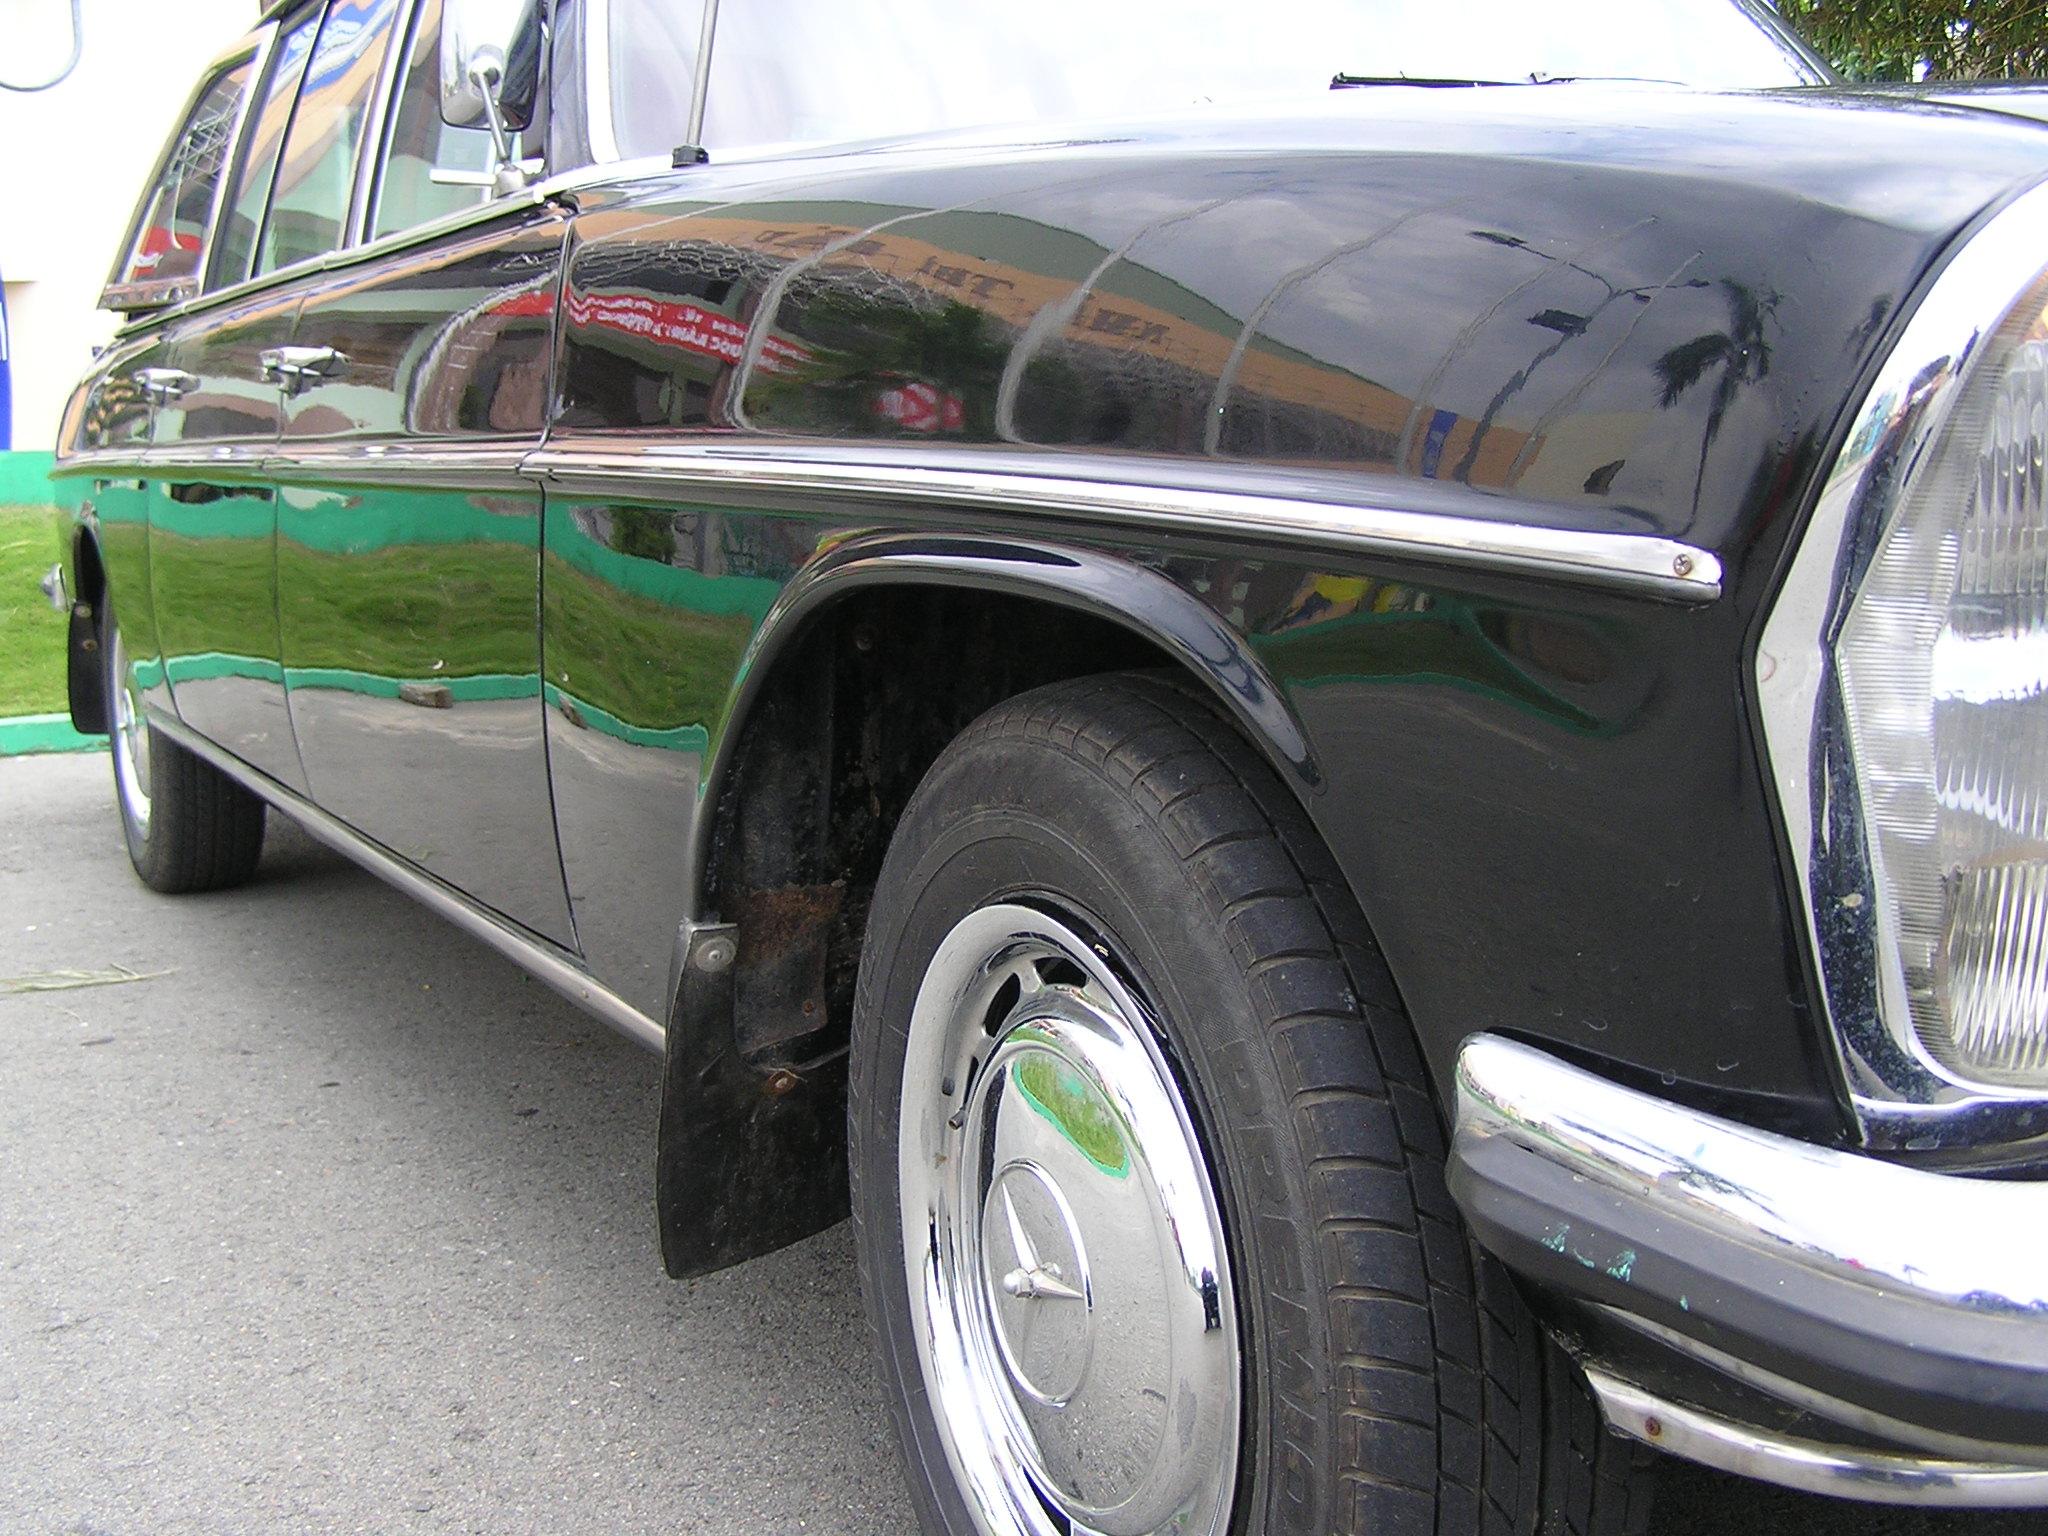 Trai-nghiem-qua-khu-ngot-ngao-tren-Mercedes-Benz-Limousine-230E-1969-anh-3